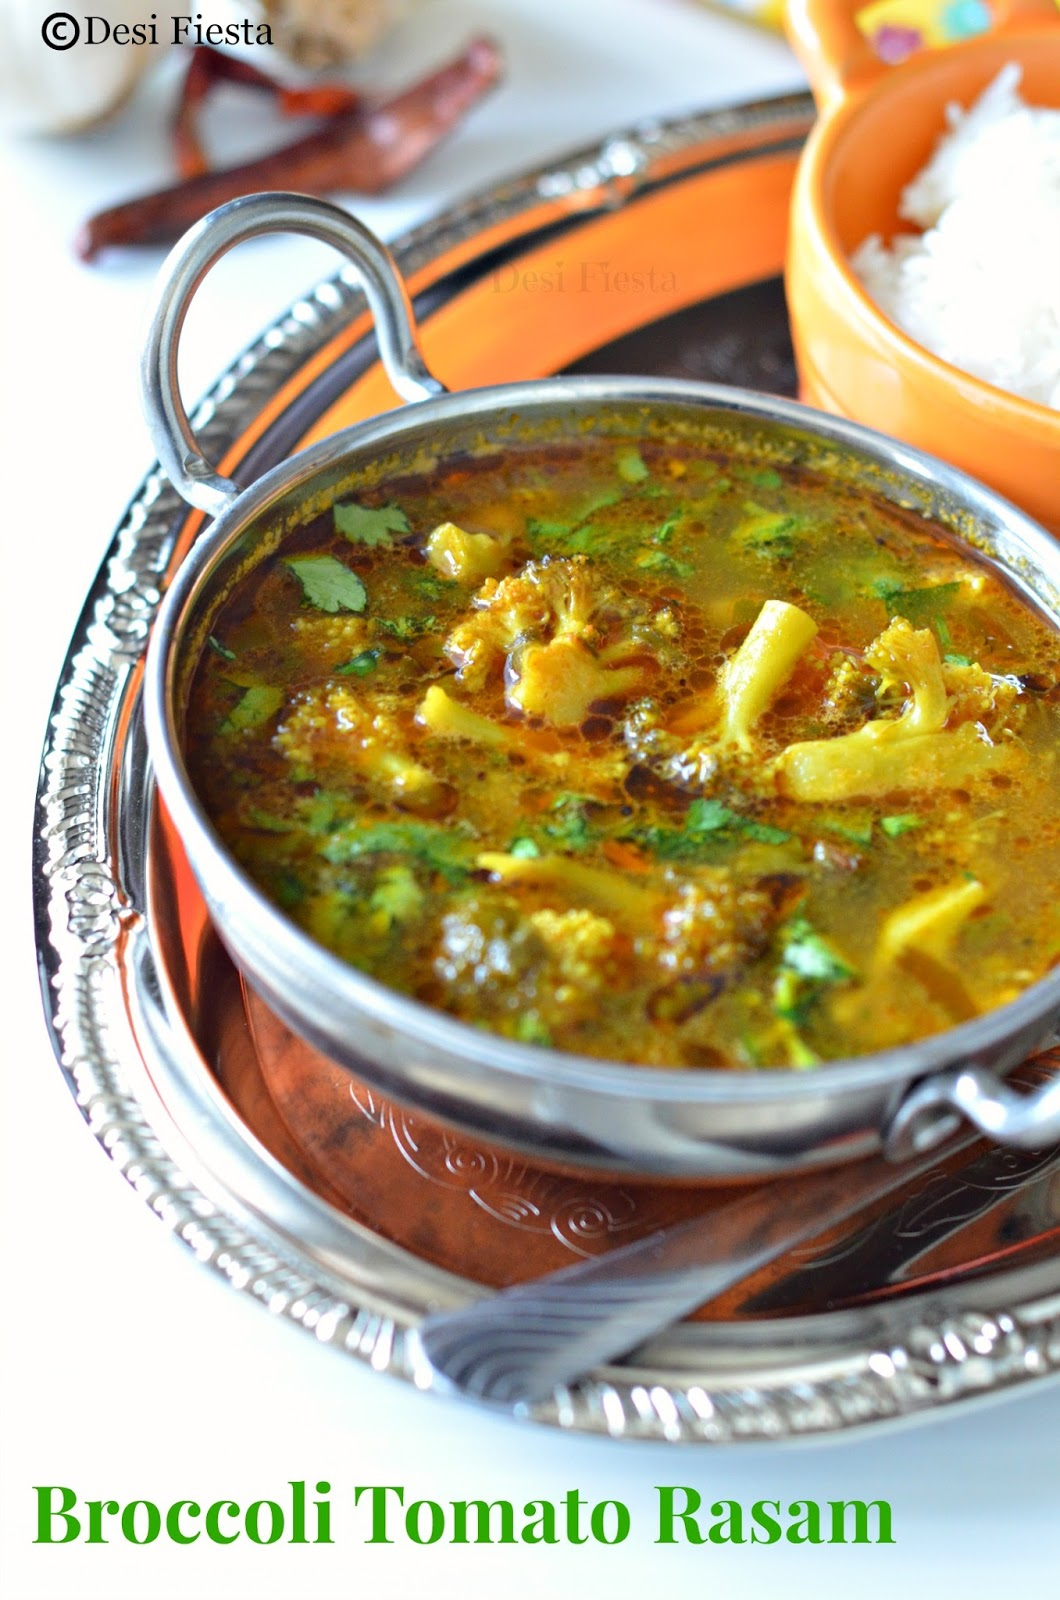 South Indian Rasam recipes